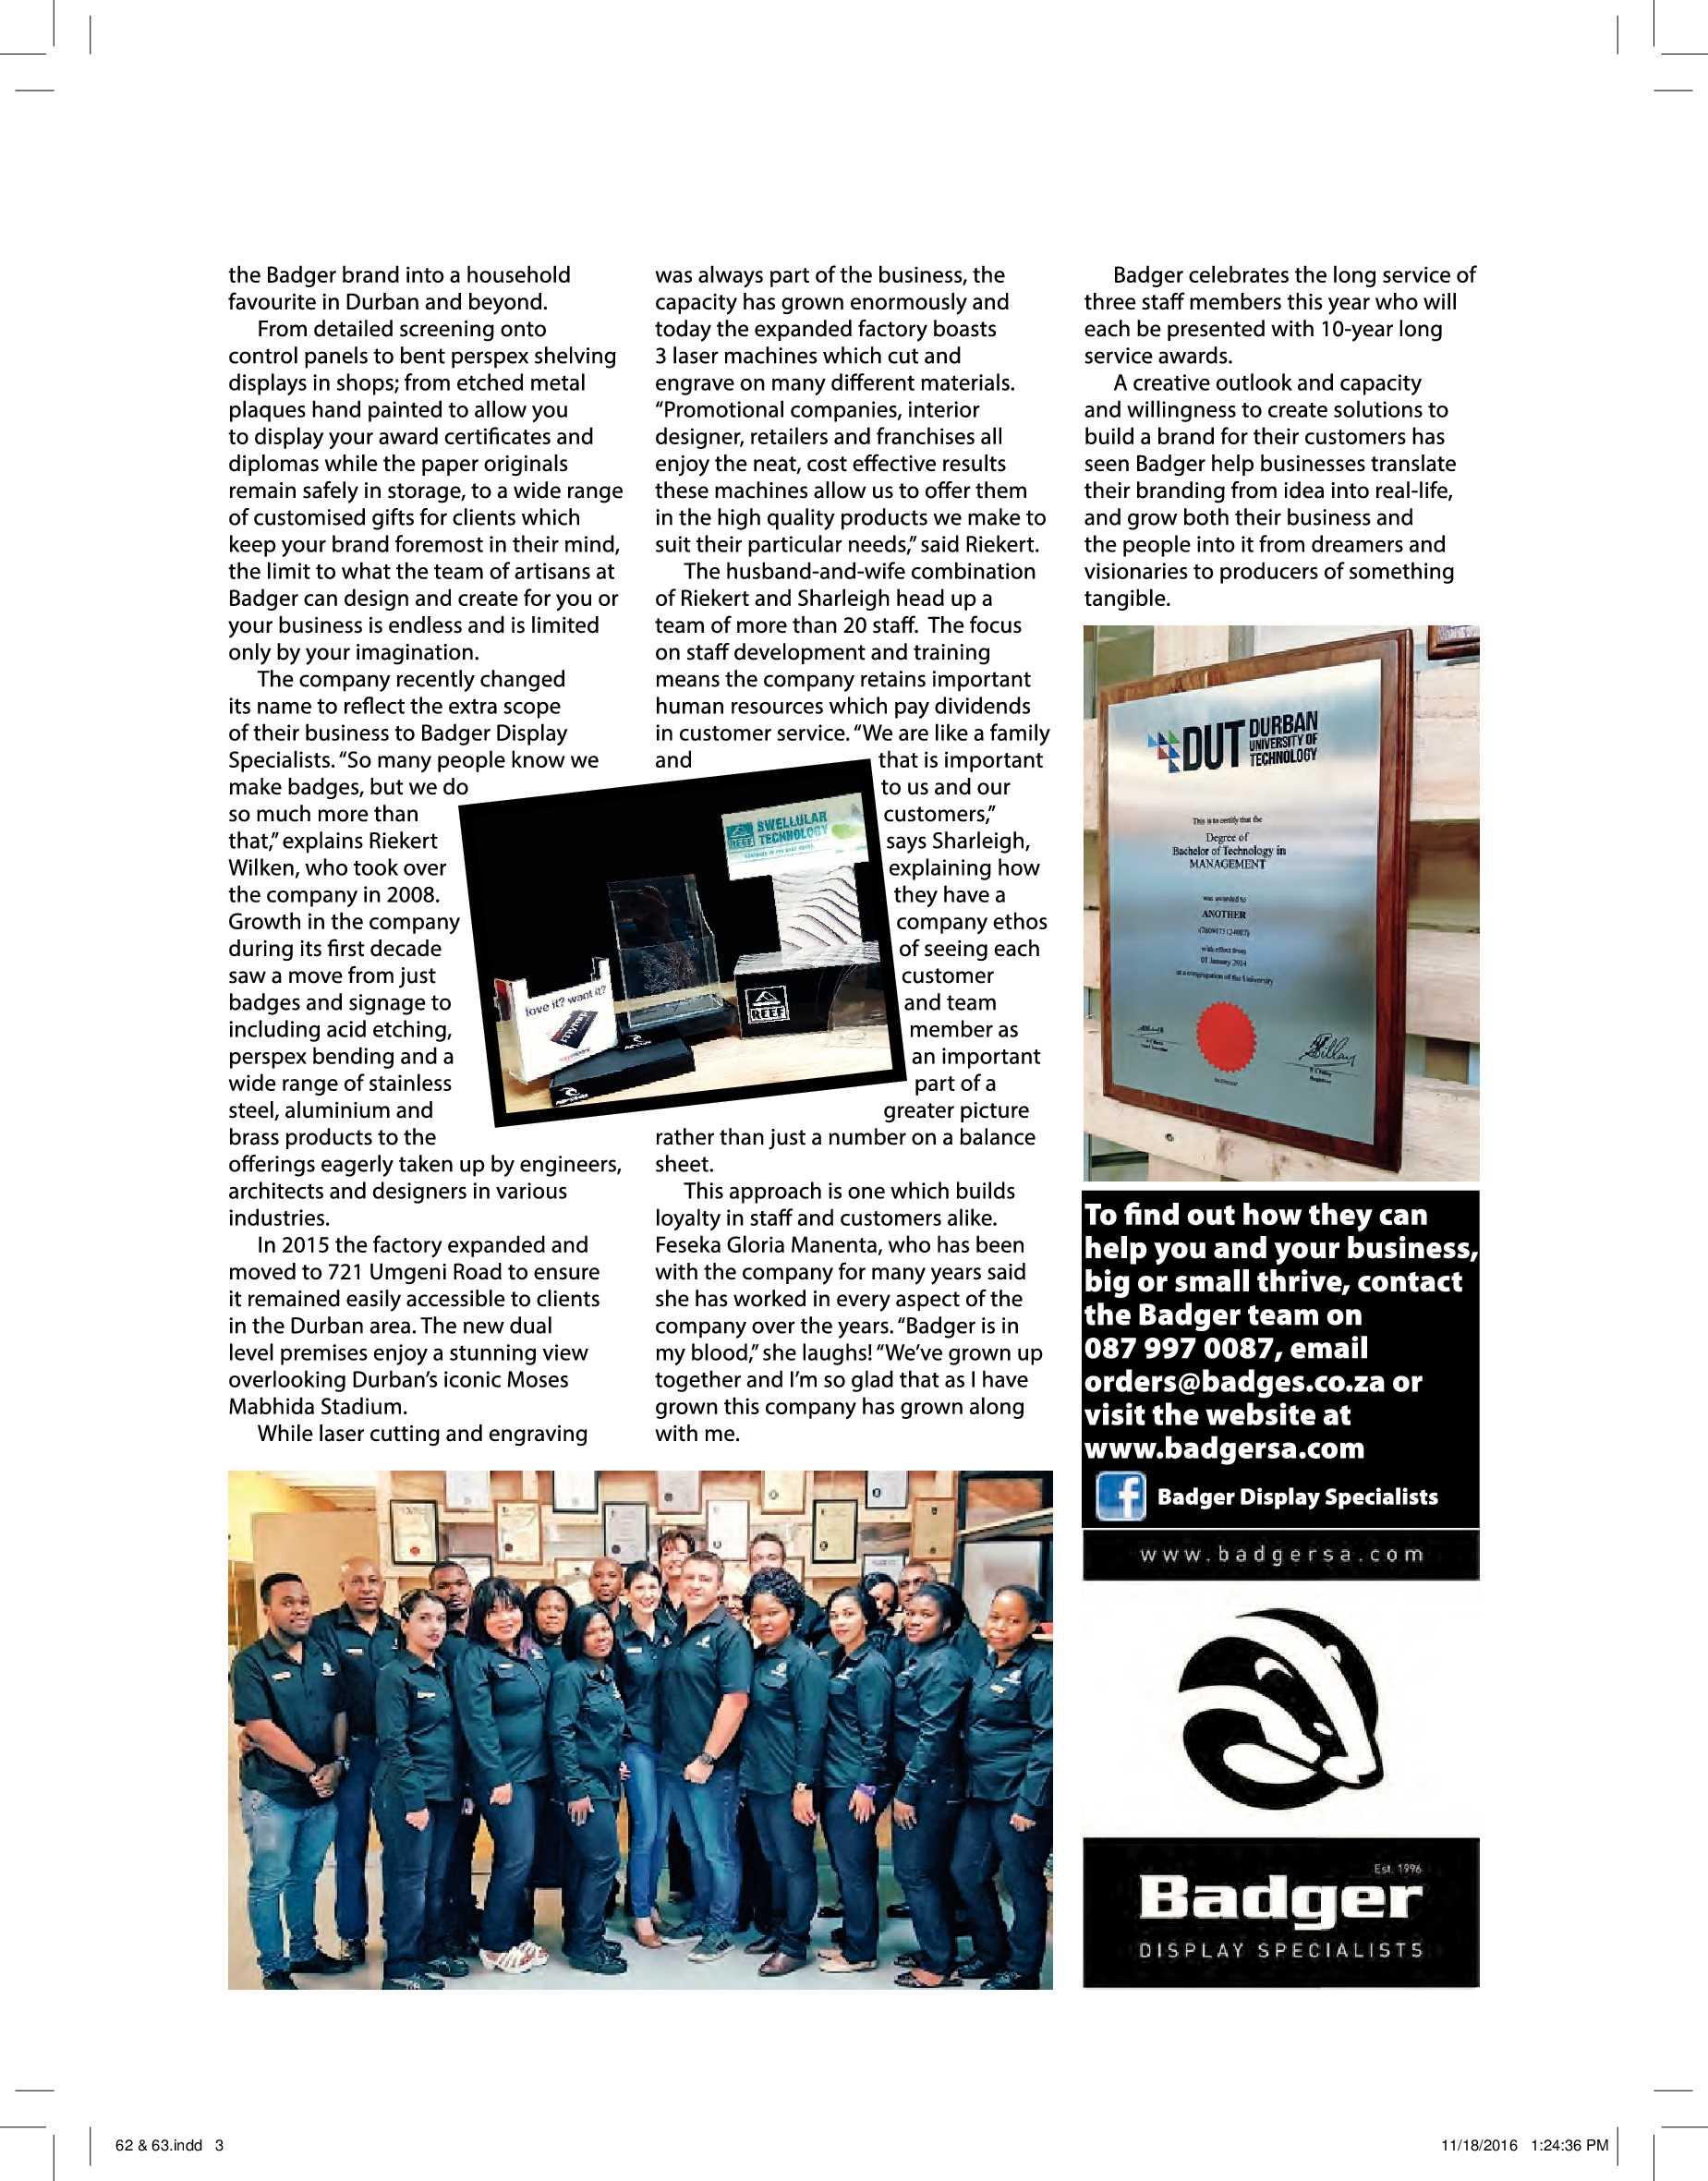 durban-get-it-magazine-december-2016-epapers-page-65